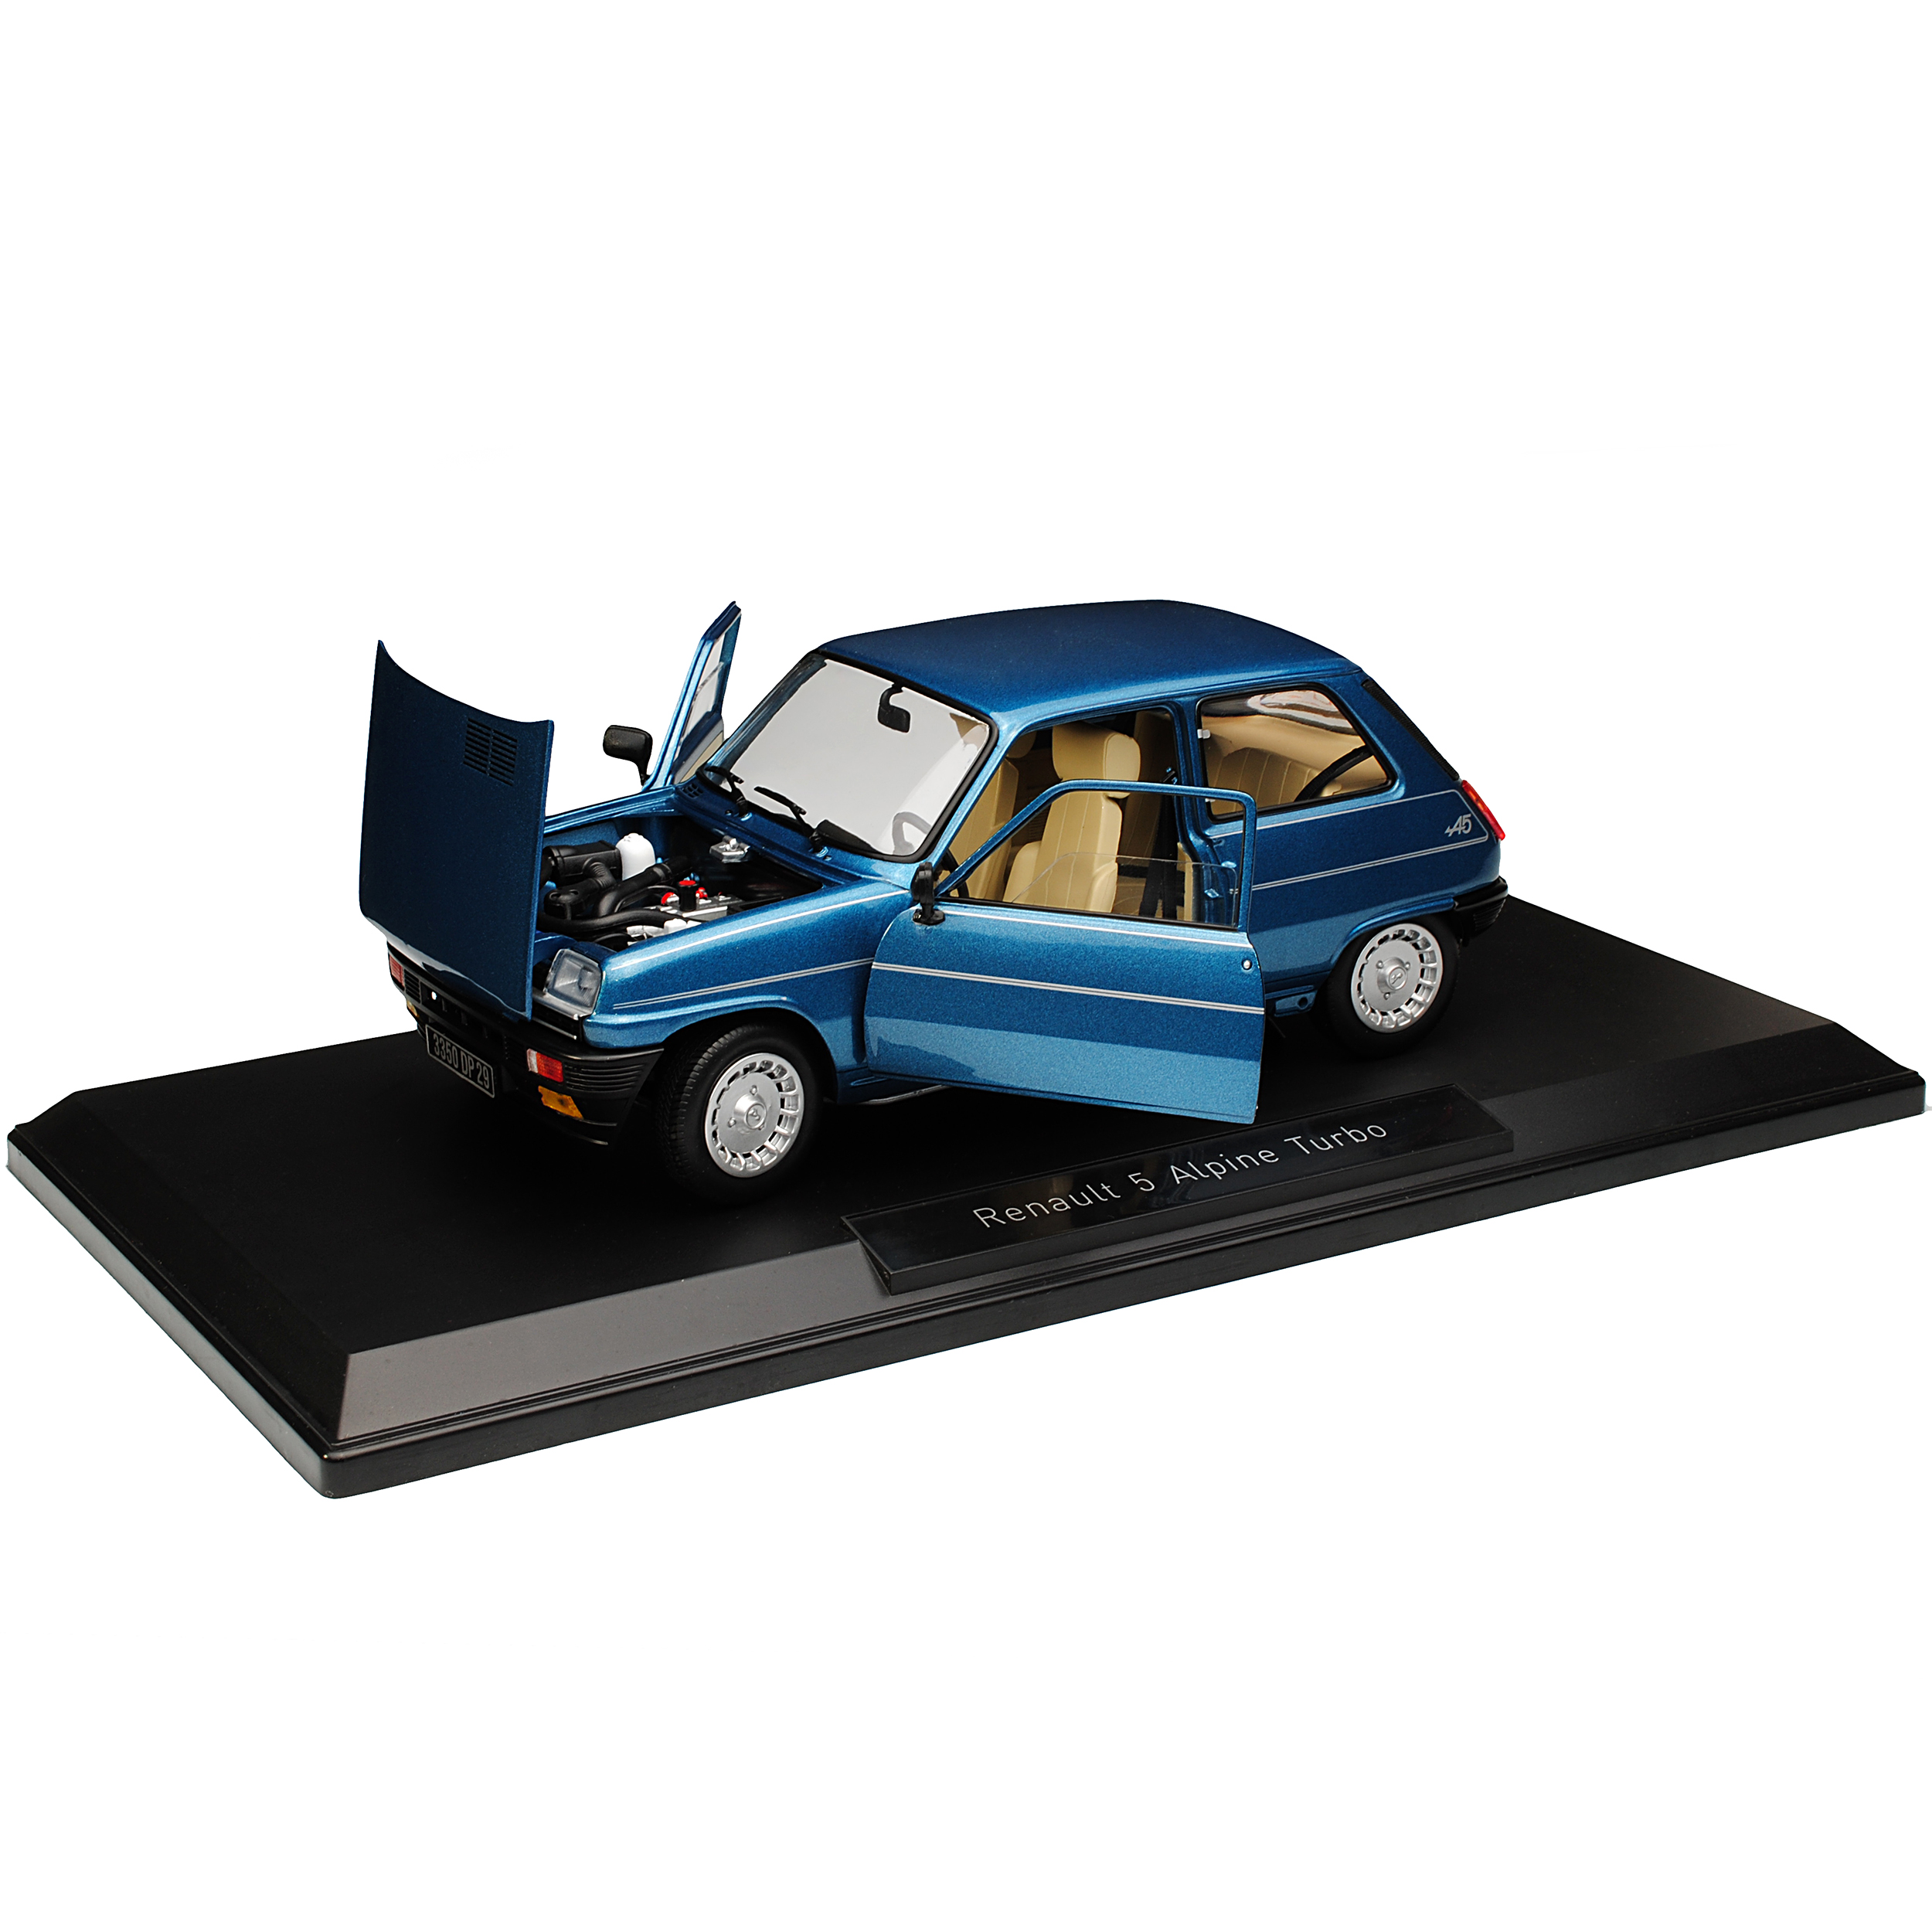 Renault-5-R5-Alpine-Turbo-azul-1-generacion-1972-1984-1-18-Norev-modelos-coches miniatura 9